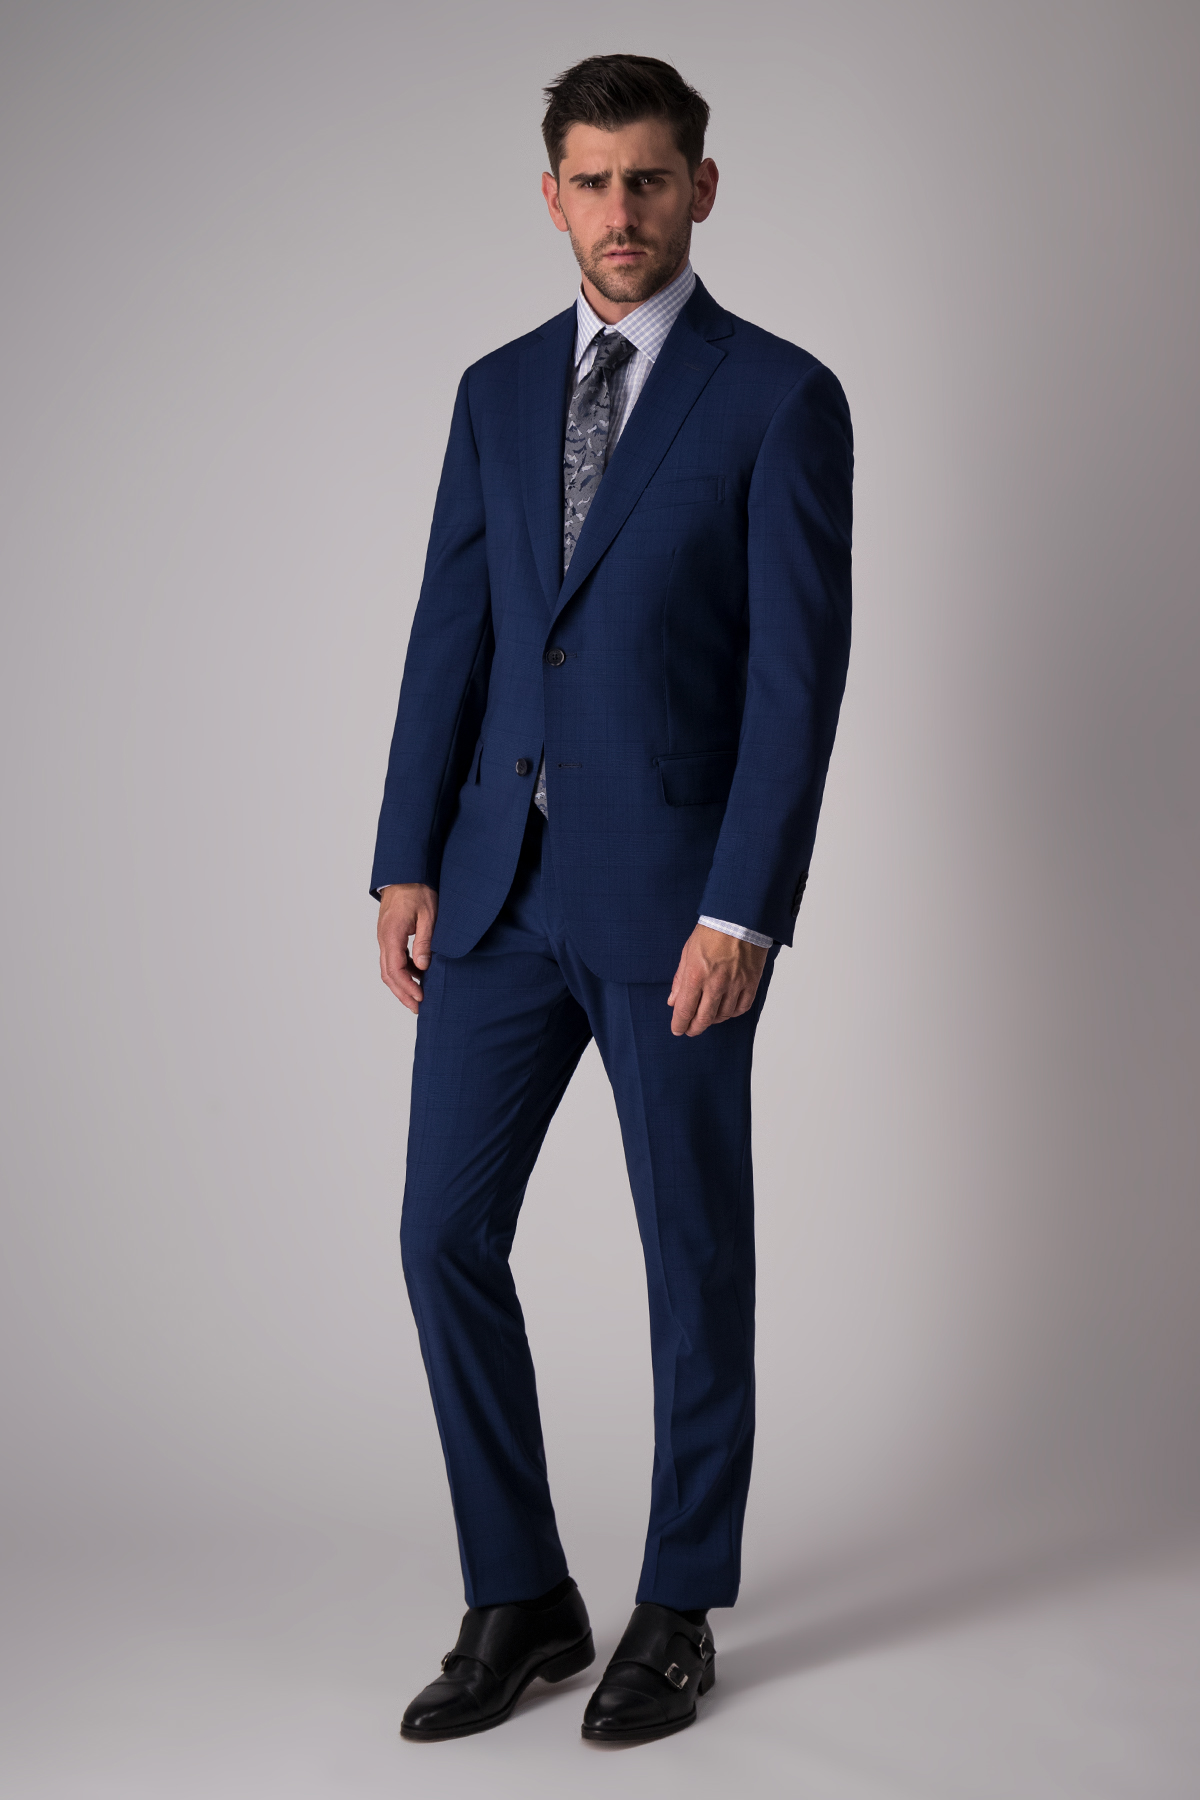 Traje Calderoni, tejido italiano azul, slim fit.